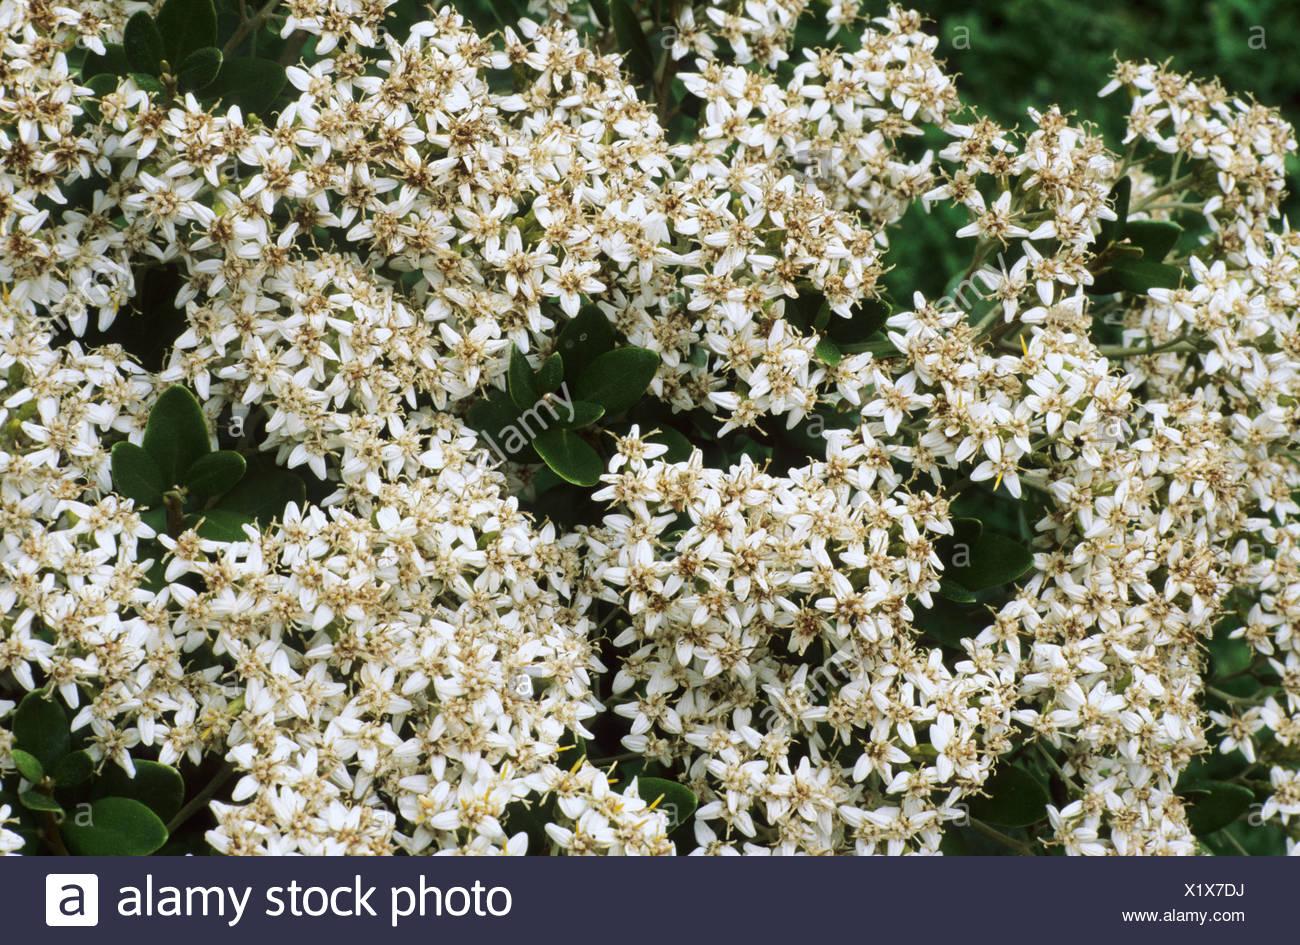 Olearia x haastii white flower flowers garden plant plants daisy olearia x haastii white flower flowers garden plant plants daisy bush mightylinksfo